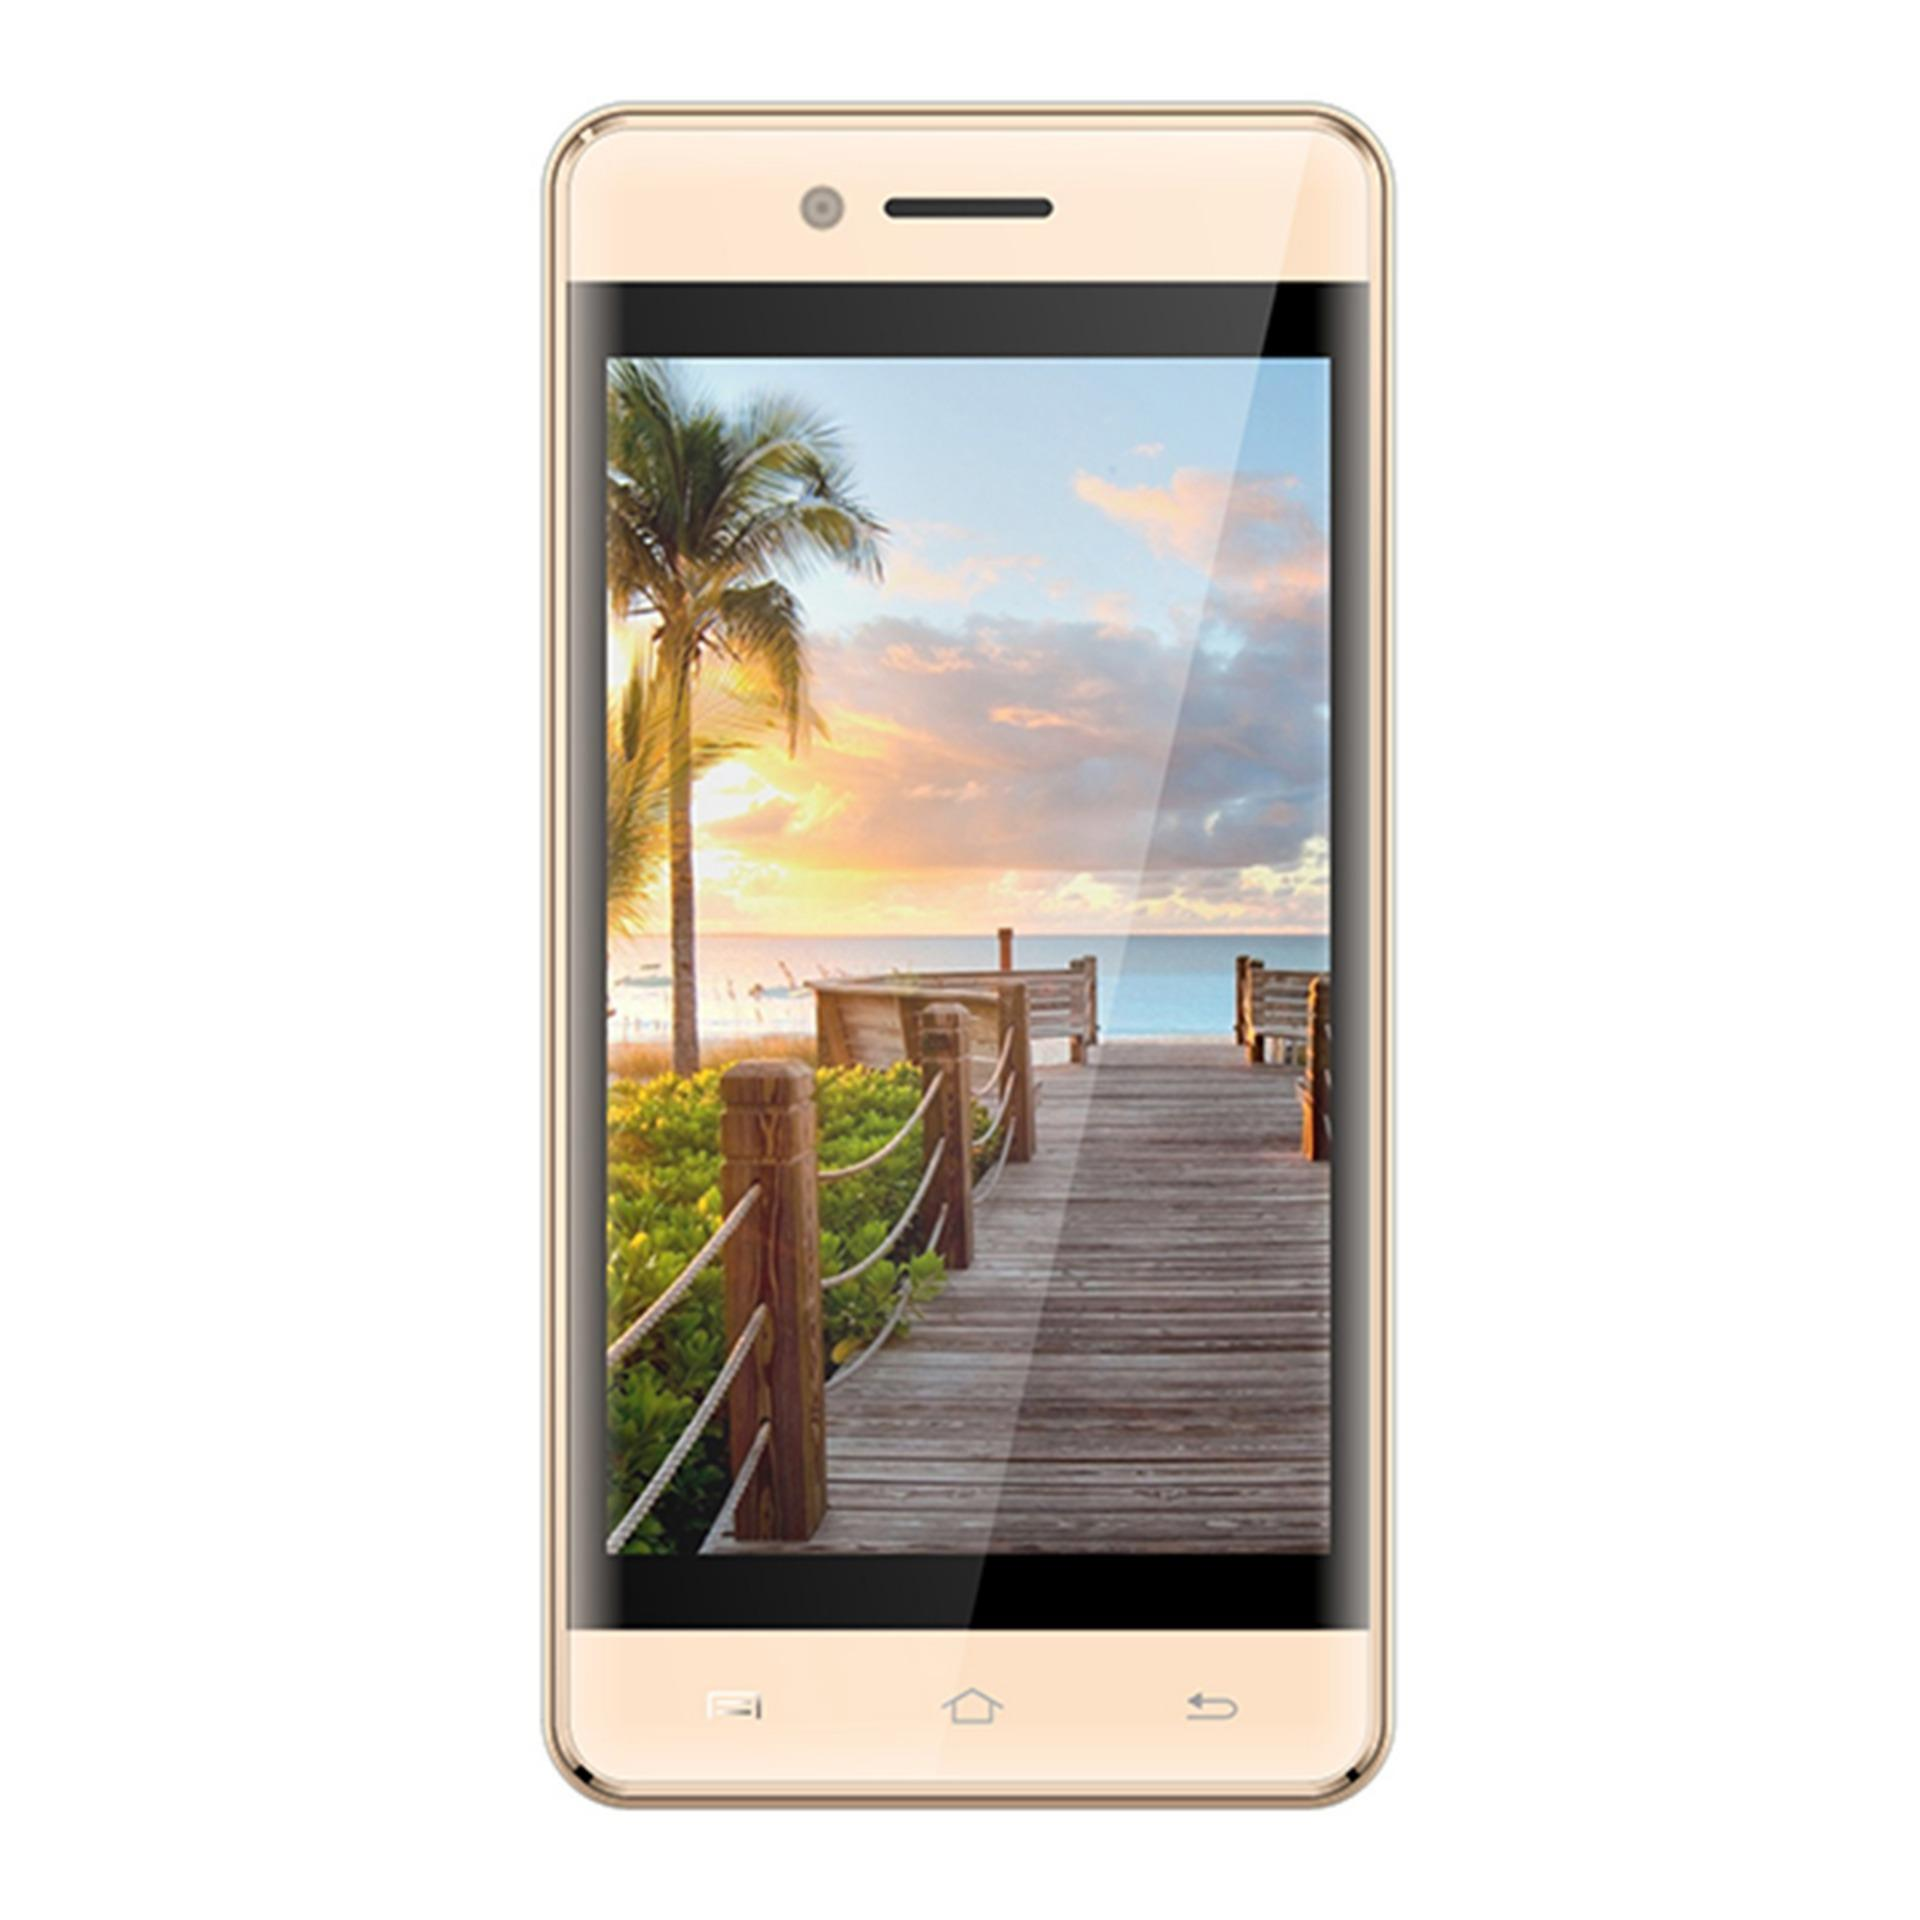 "Symphony E90 - Smartphone - 4"" - 512MB RAM - 8GB ROM - 2MP Camera - Gold"